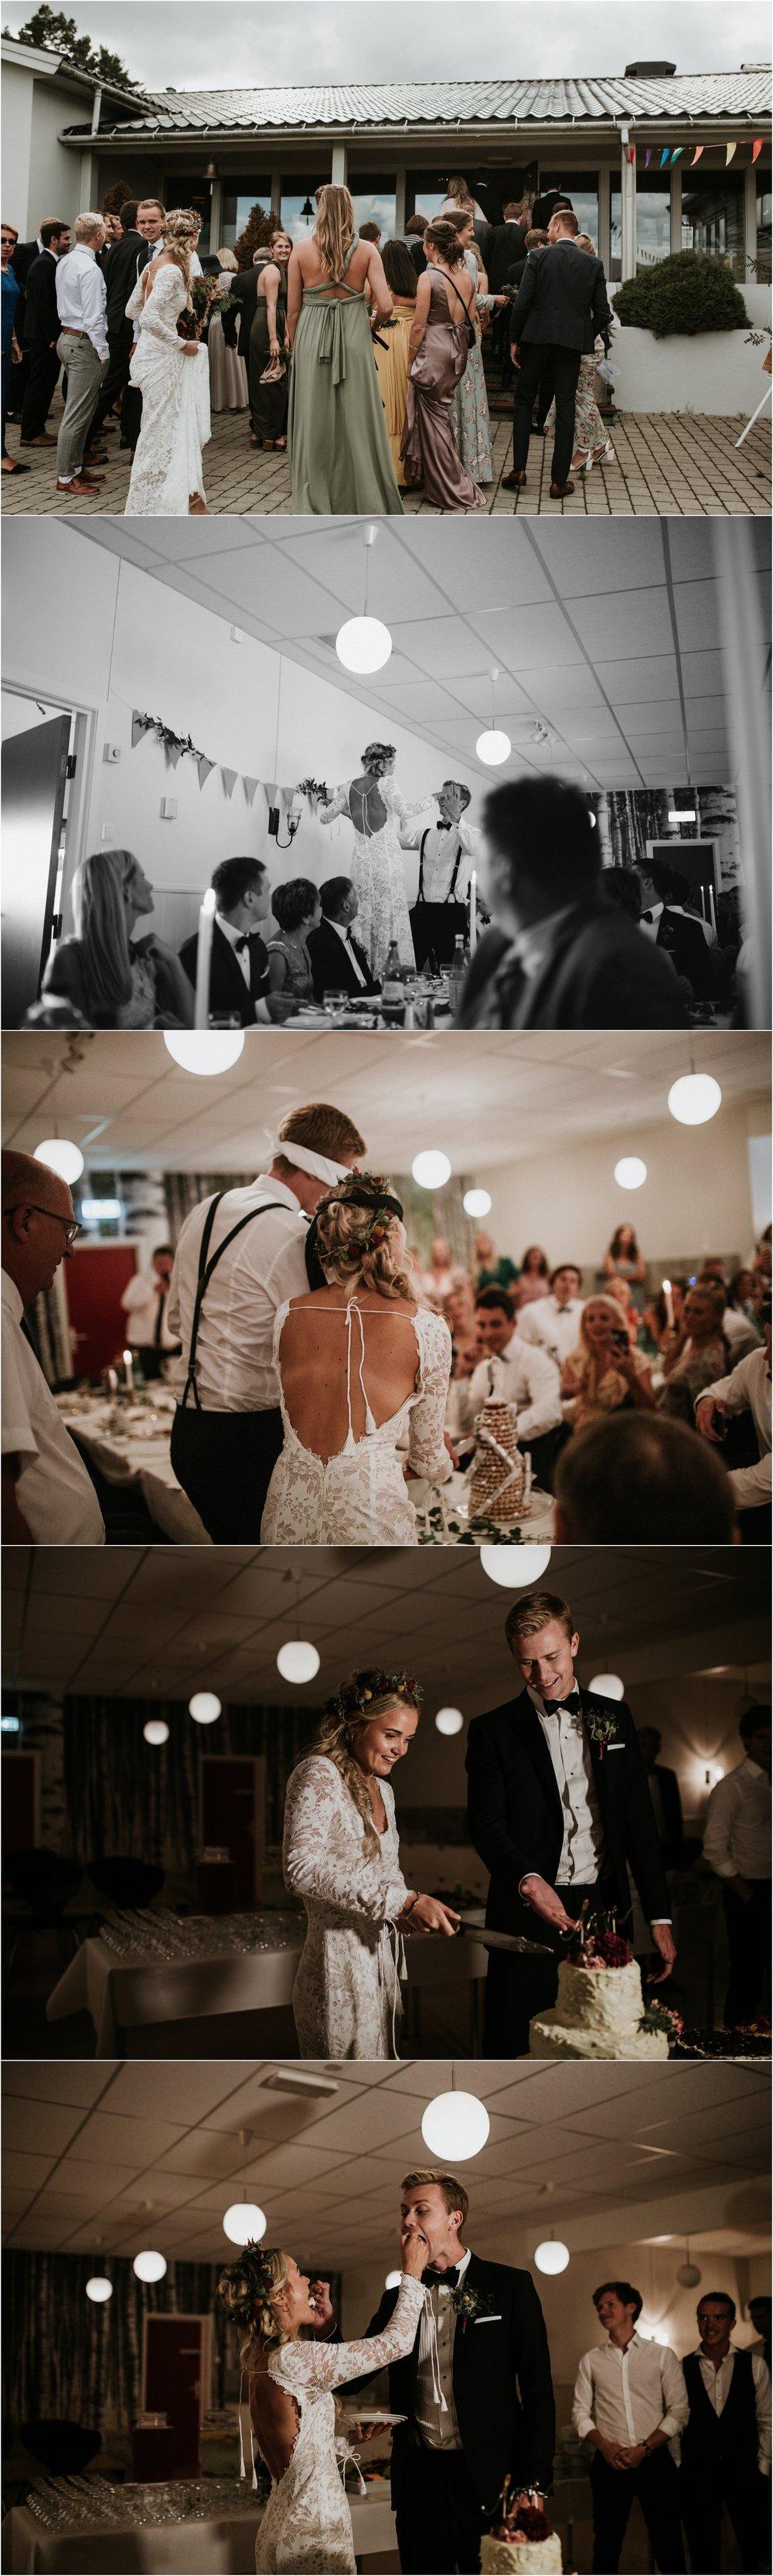 Norway-wedding-photographer-194.jpg